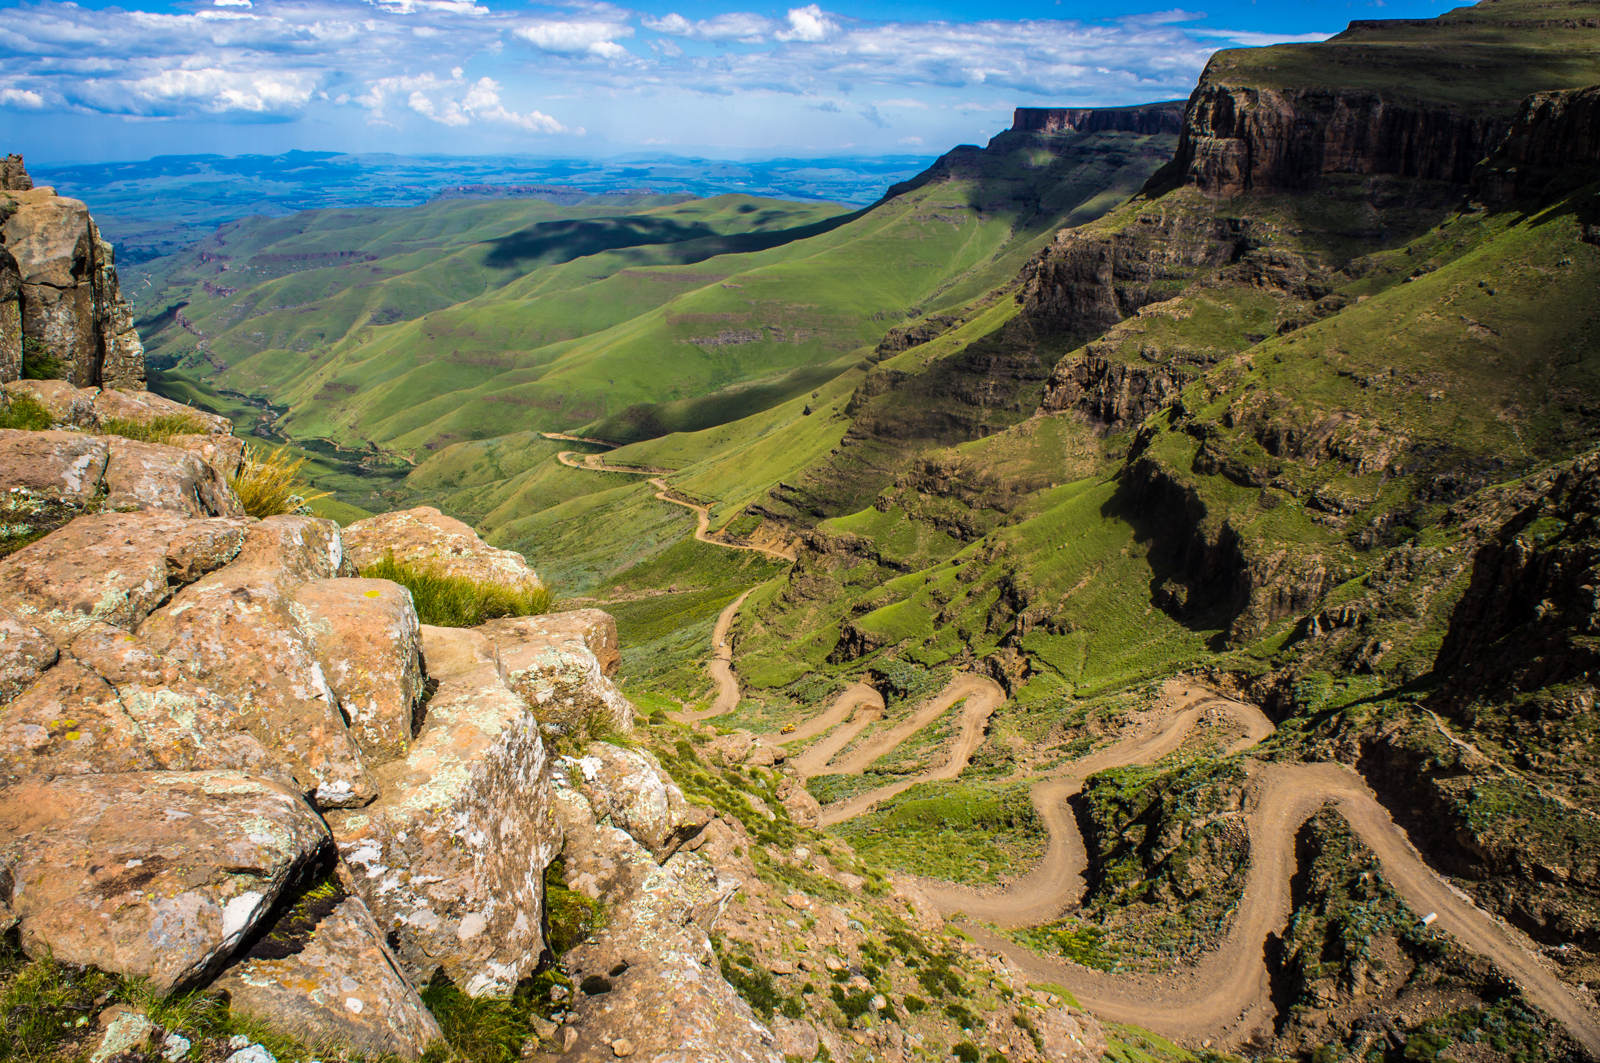 Sani_Pass_heading_into_Lesotho.jpg